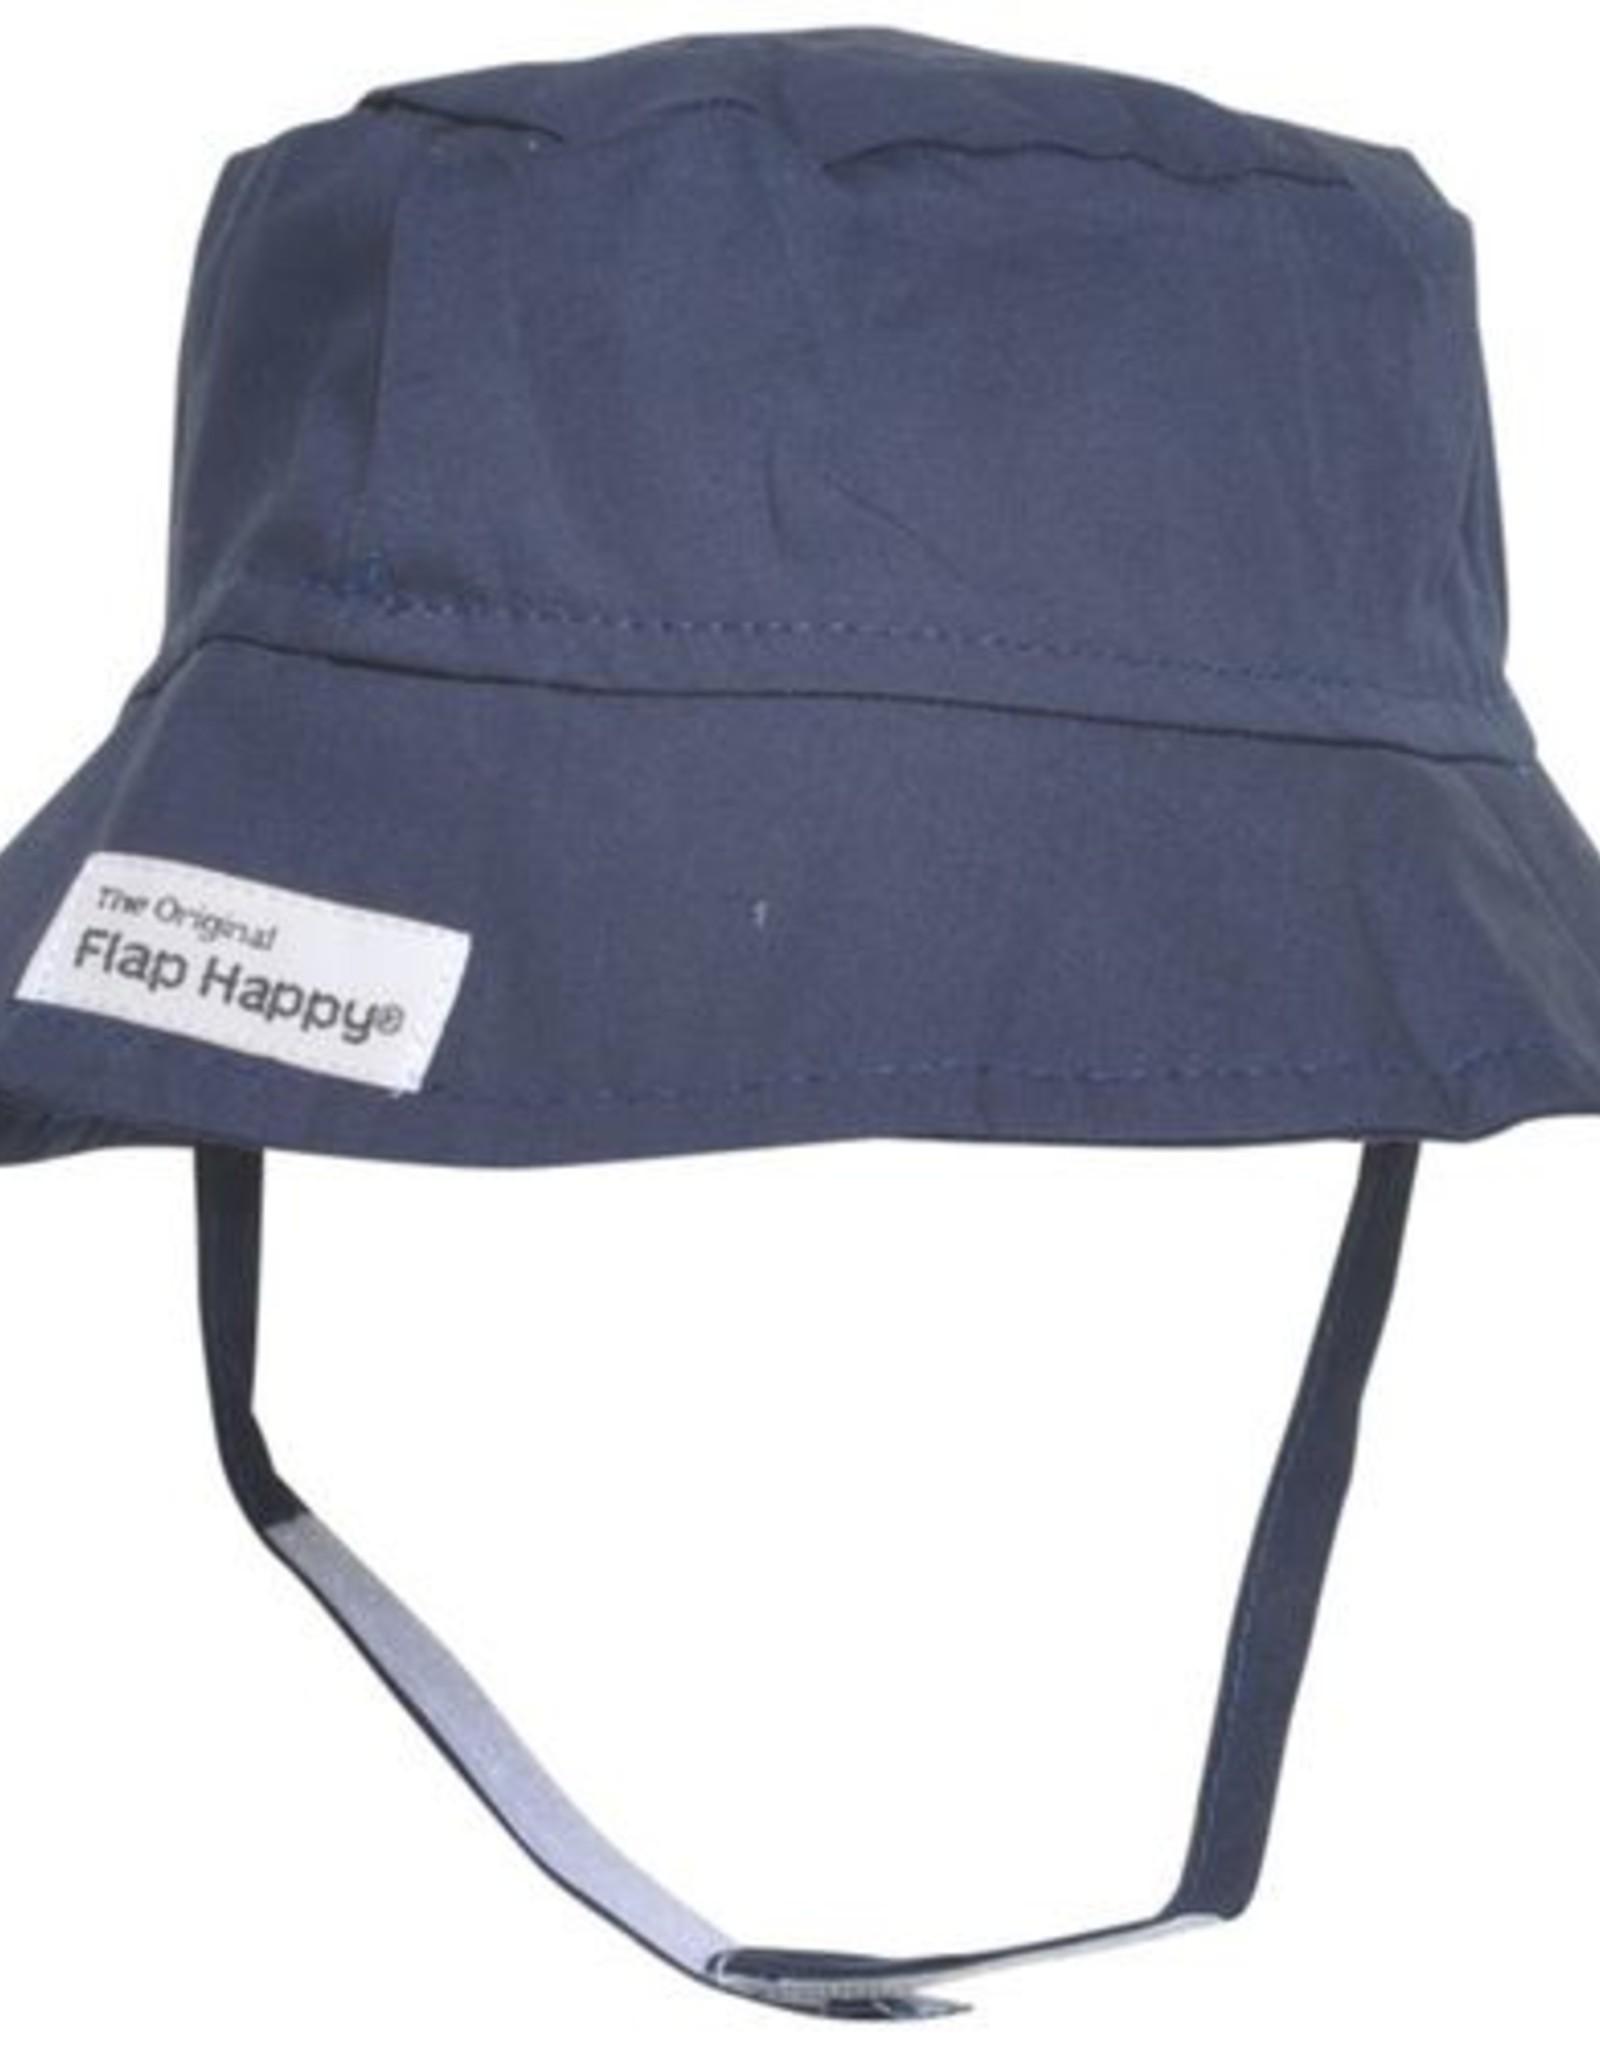 Flap Happy Bucket Hat Navy